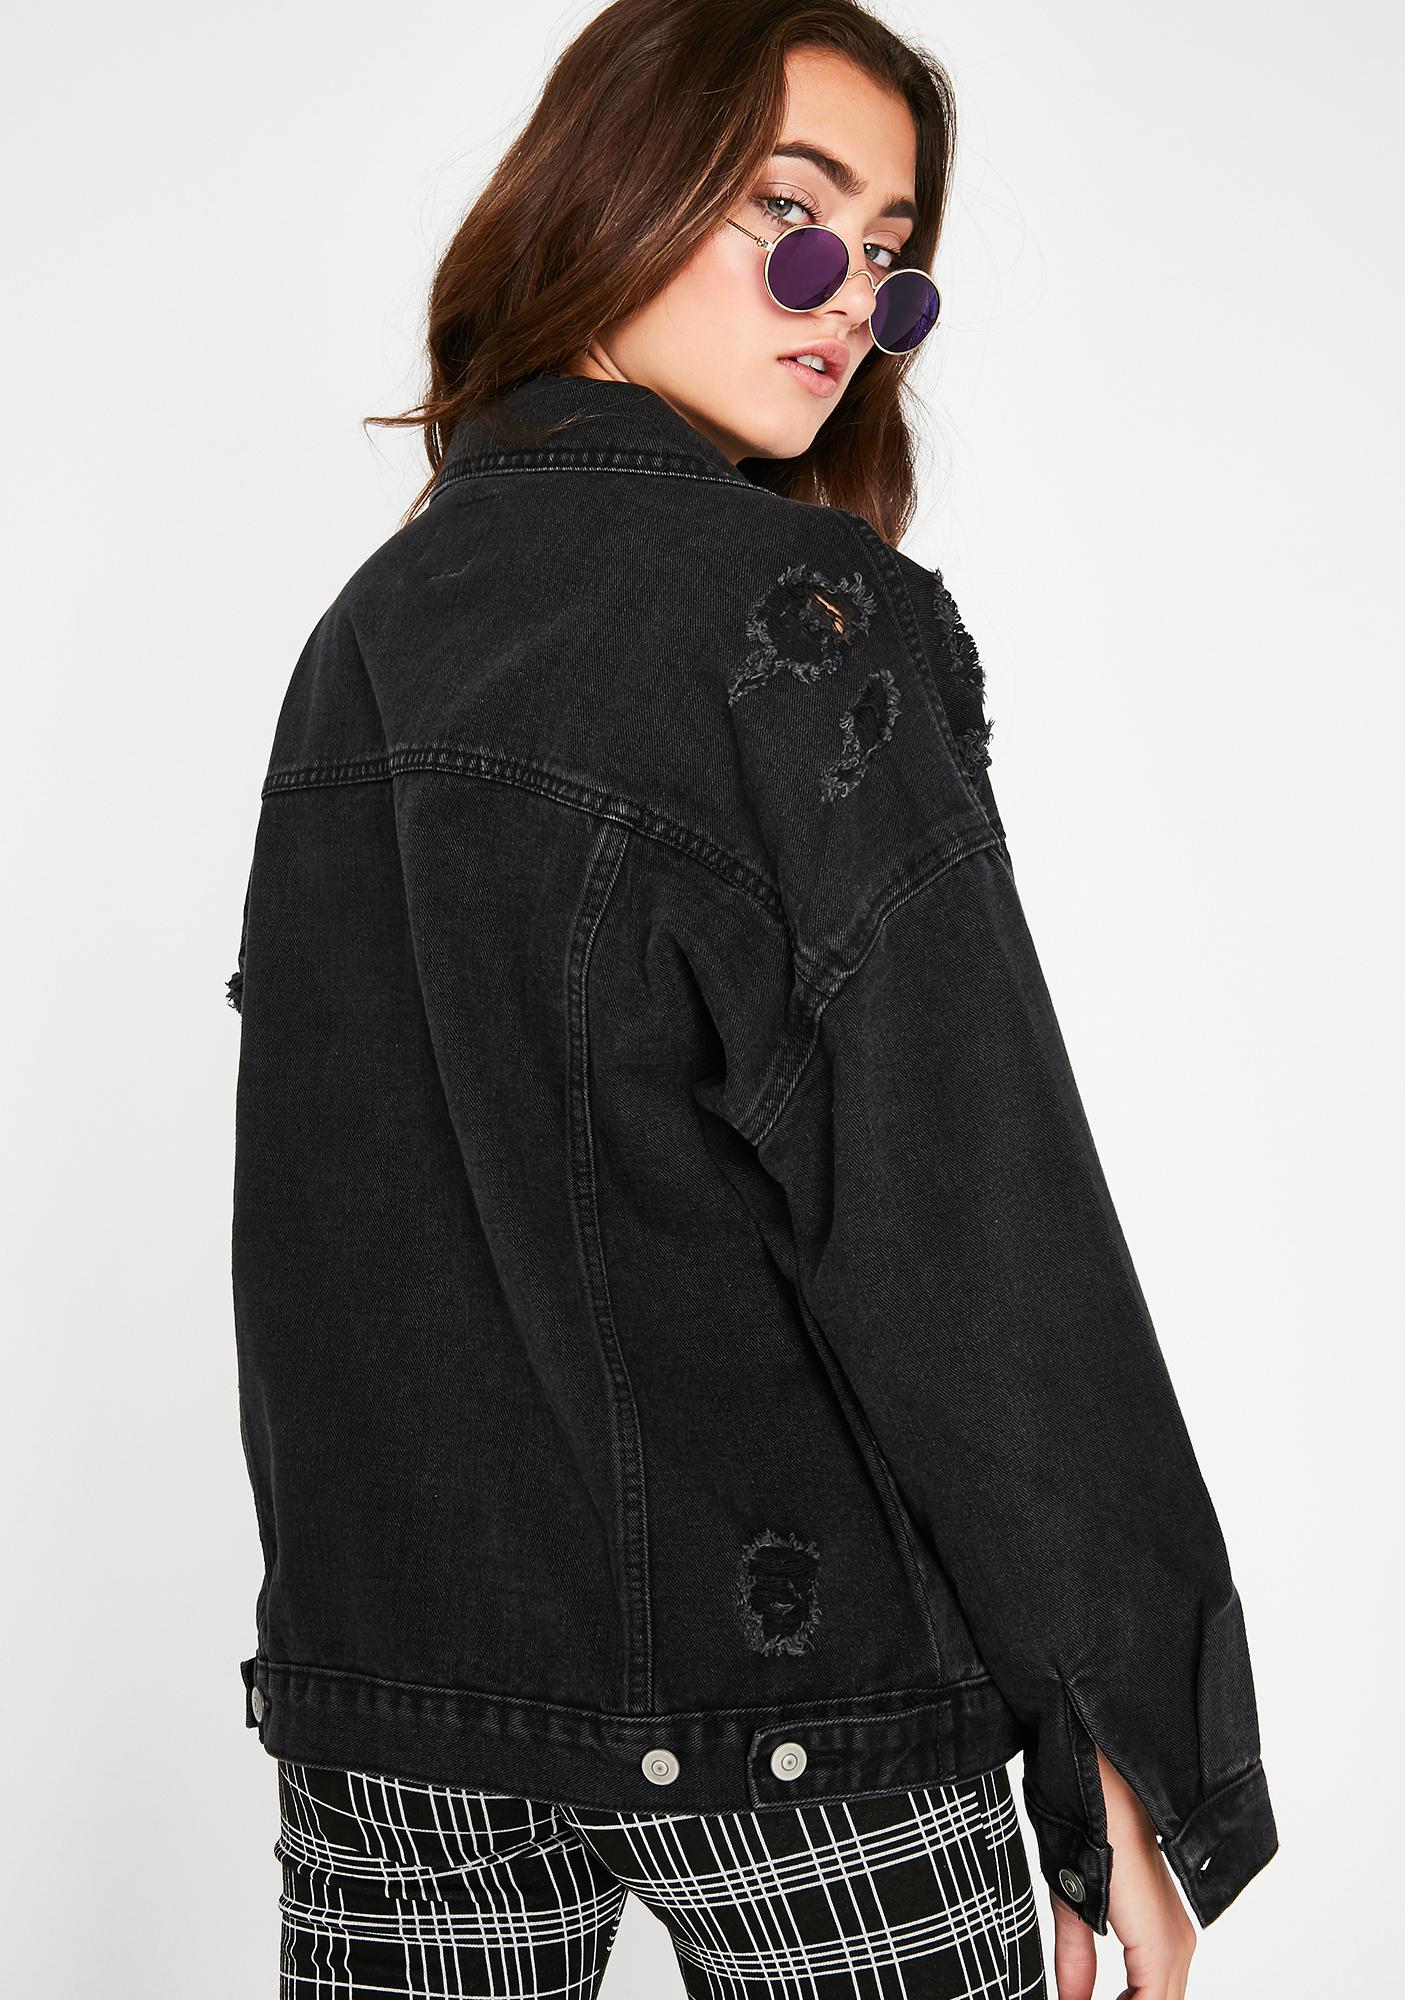 Ink Greased Lightening Denim Jacket